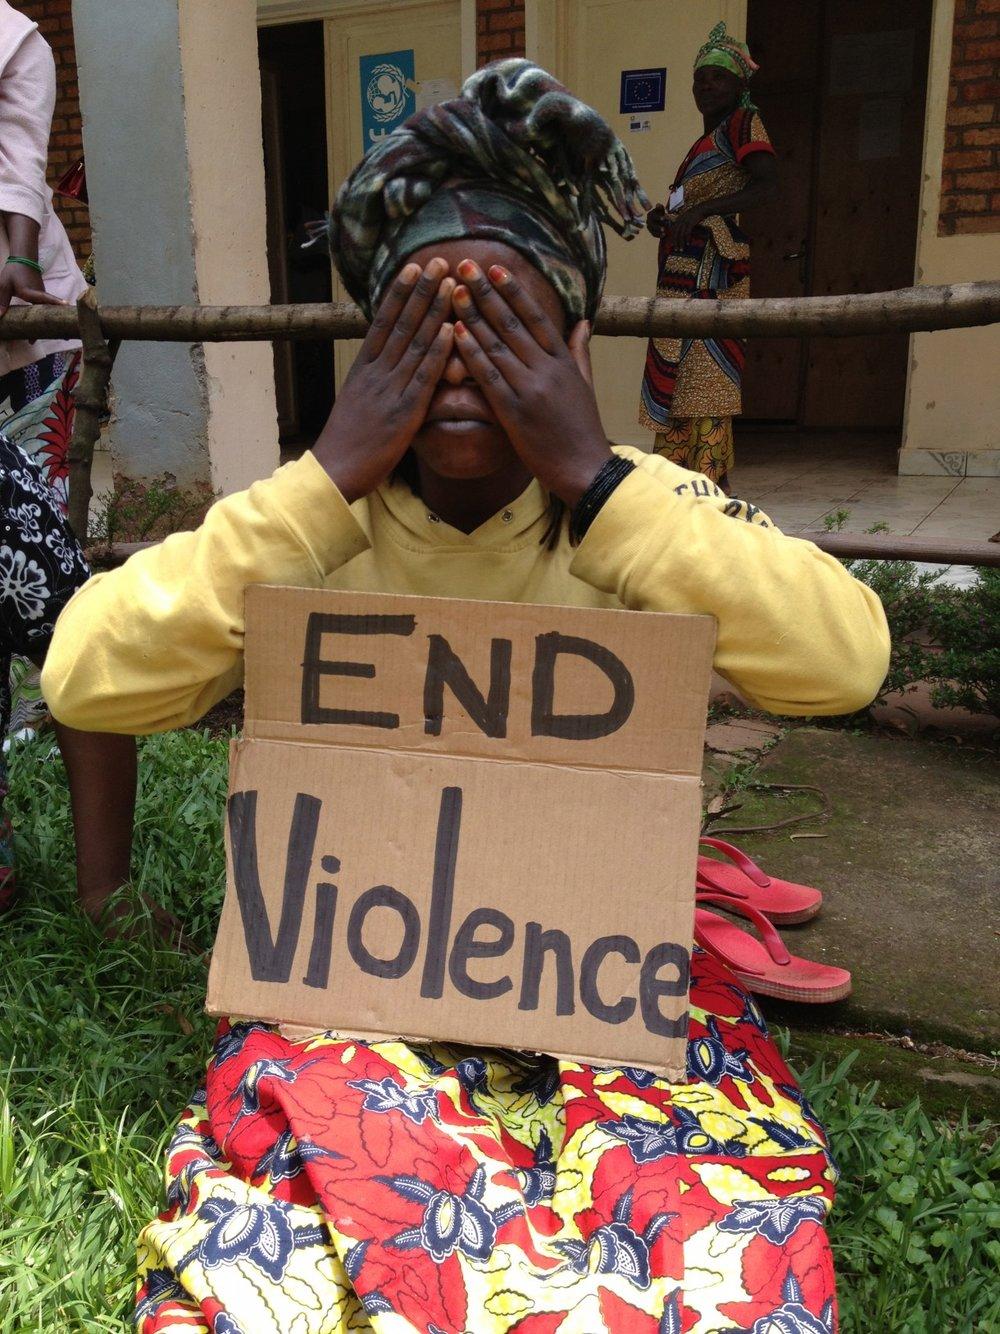 congo violence against women.jpg